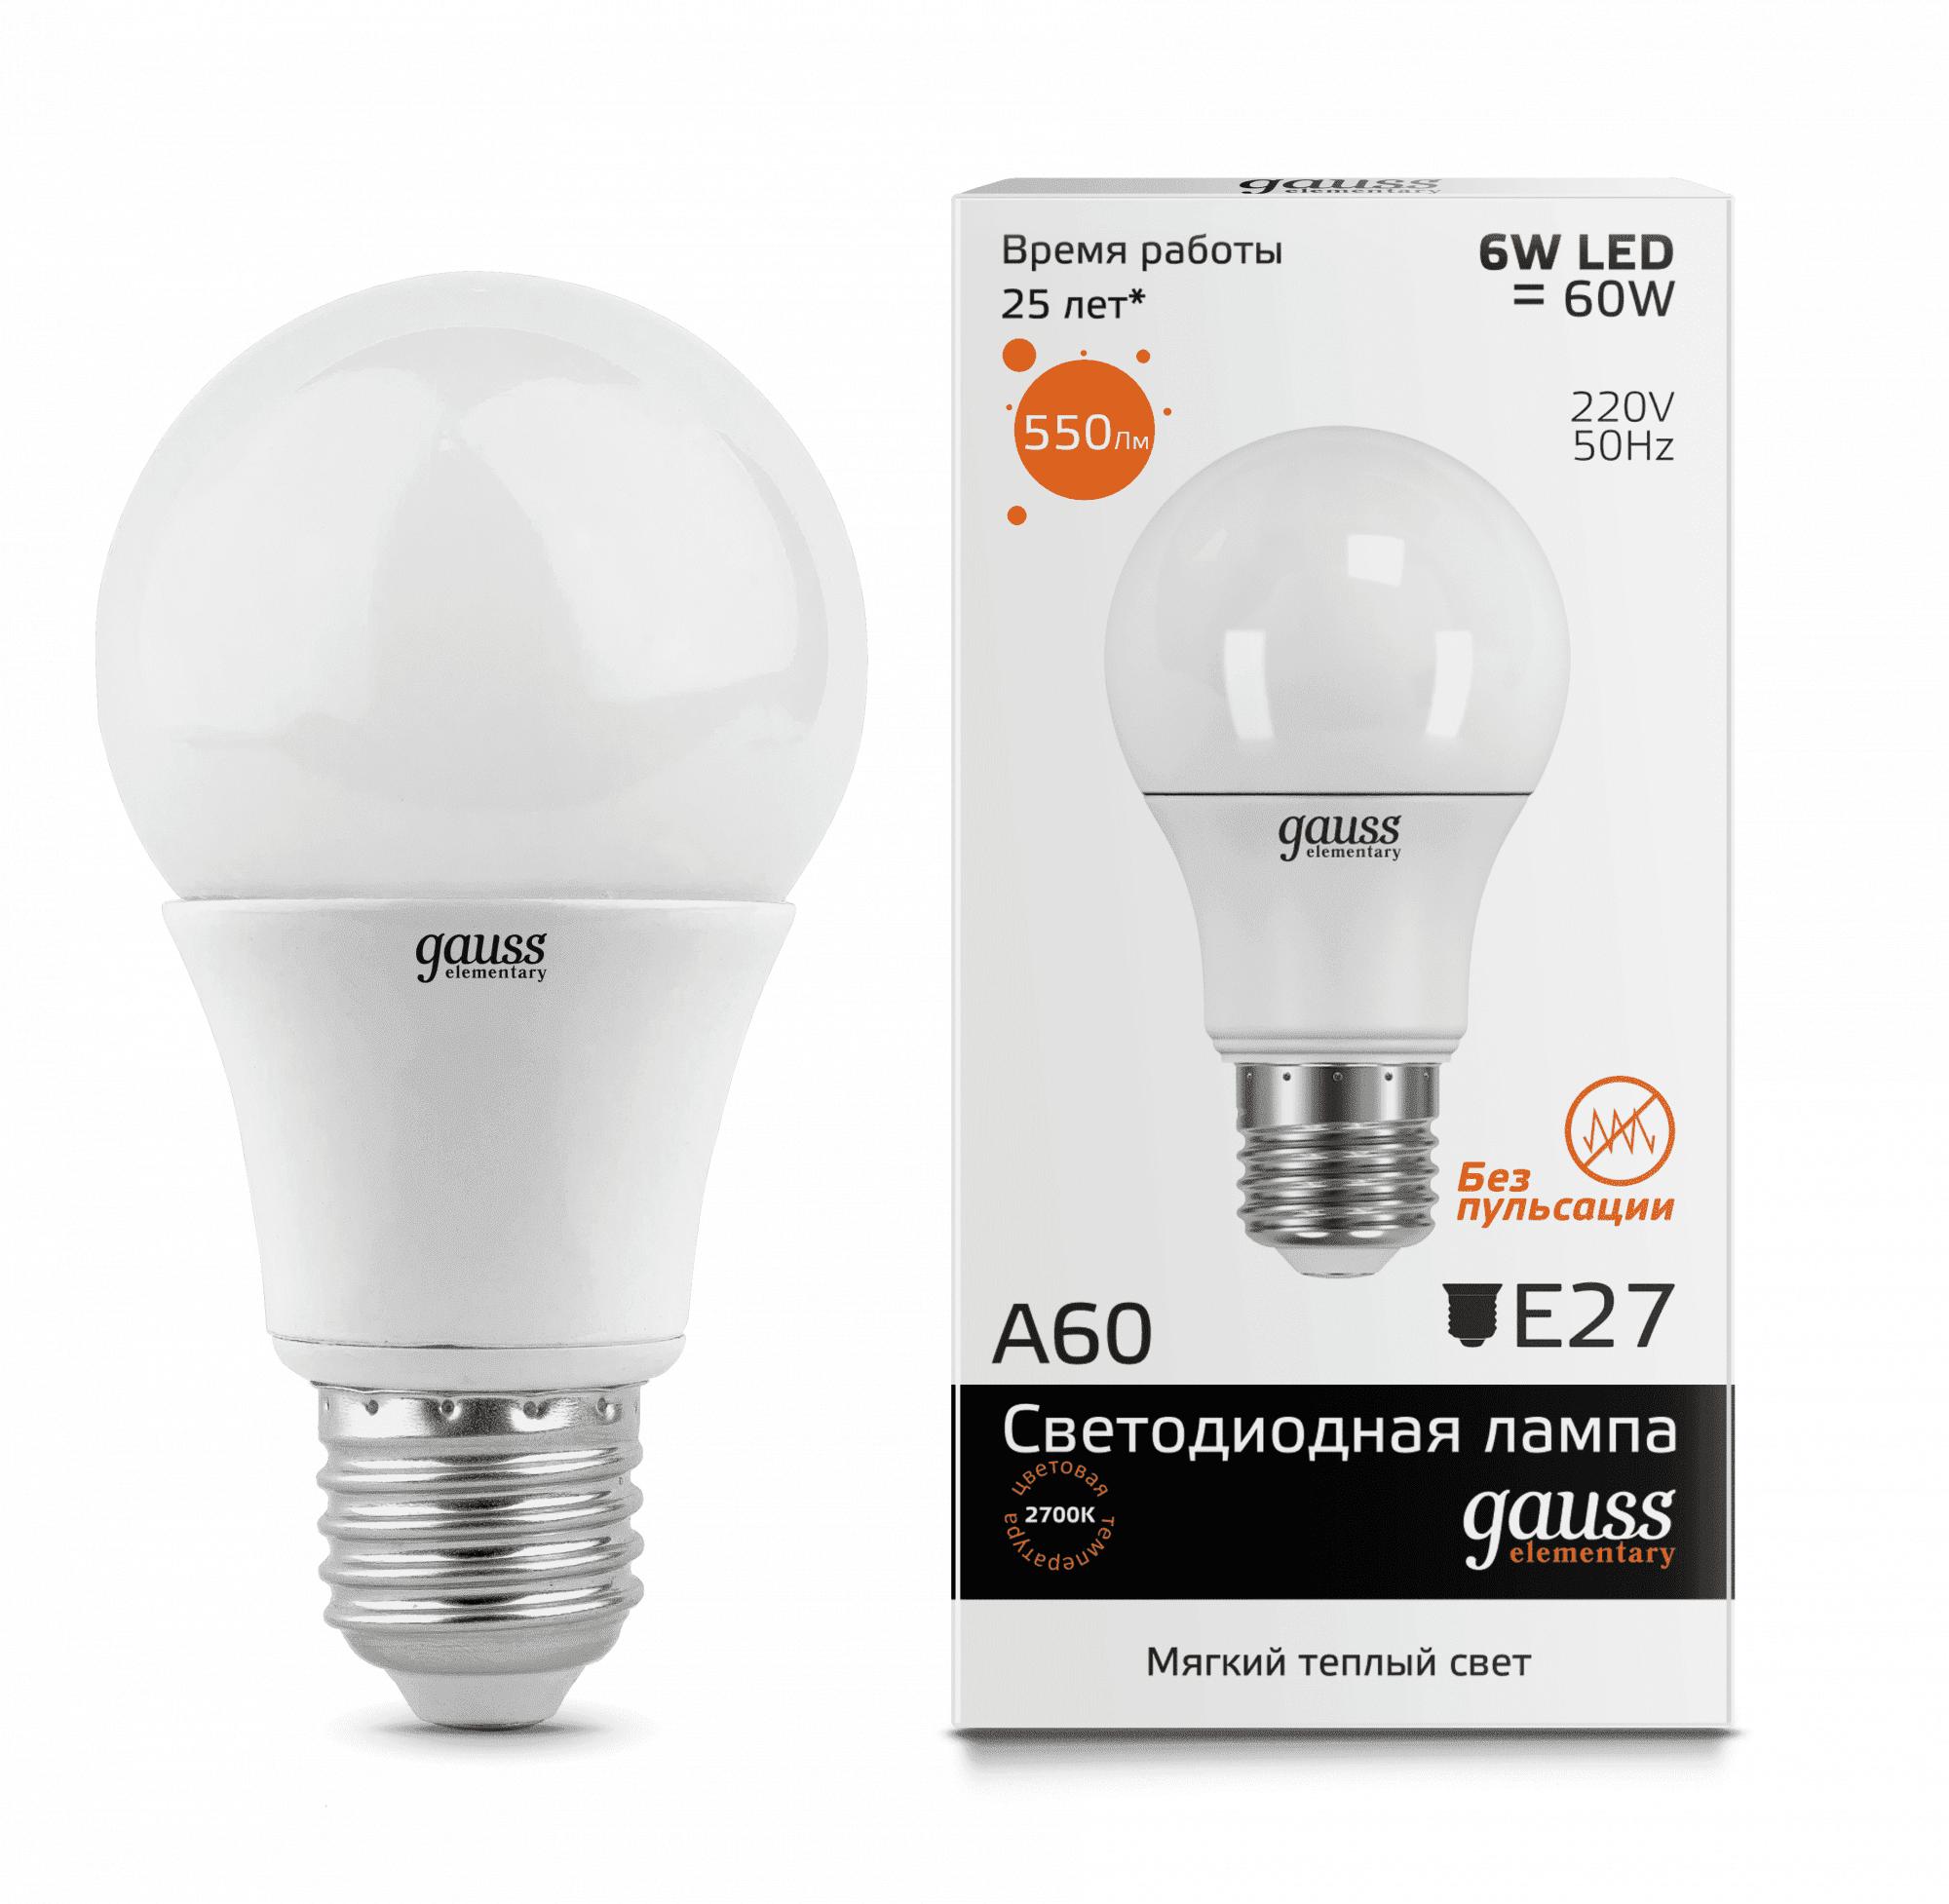 Gauss LED Elementary A60 E27 6W 2700K арт. 23216